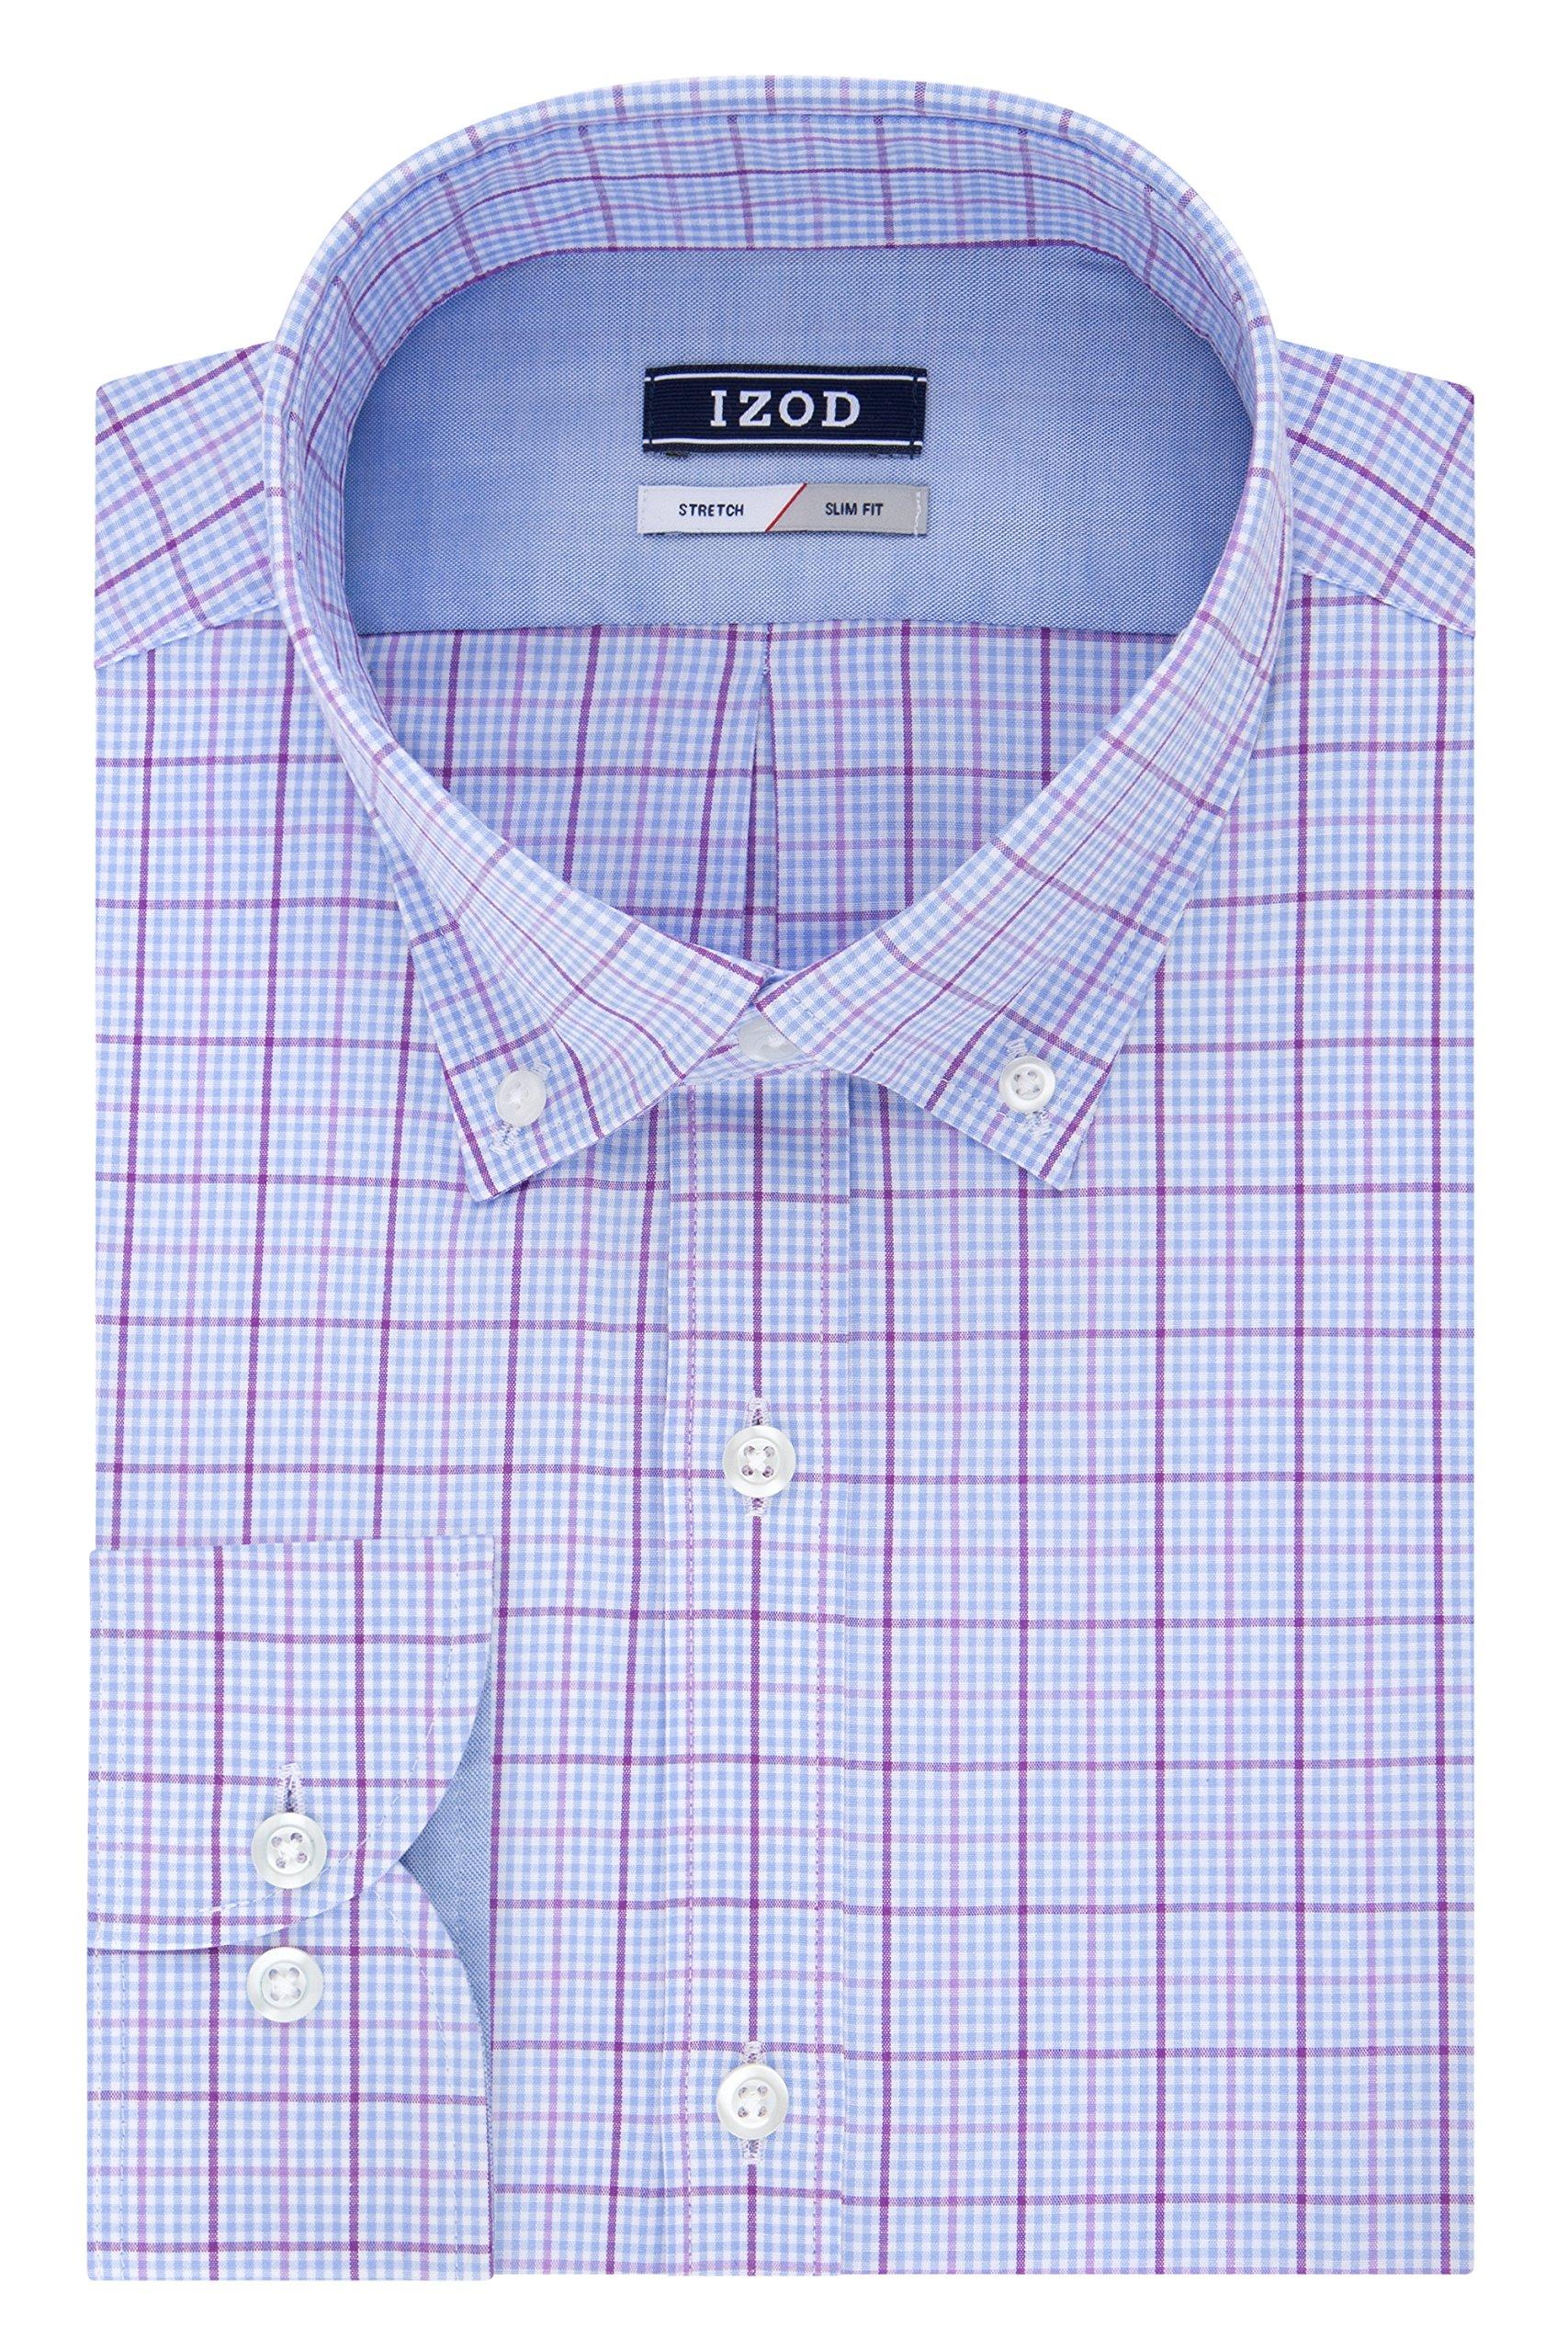 IZOD Men's Slim Fit Check Buttondown Collar Dress Shirt, Blue Stone, 16.5'' Neck 32''-33'' Sleeve